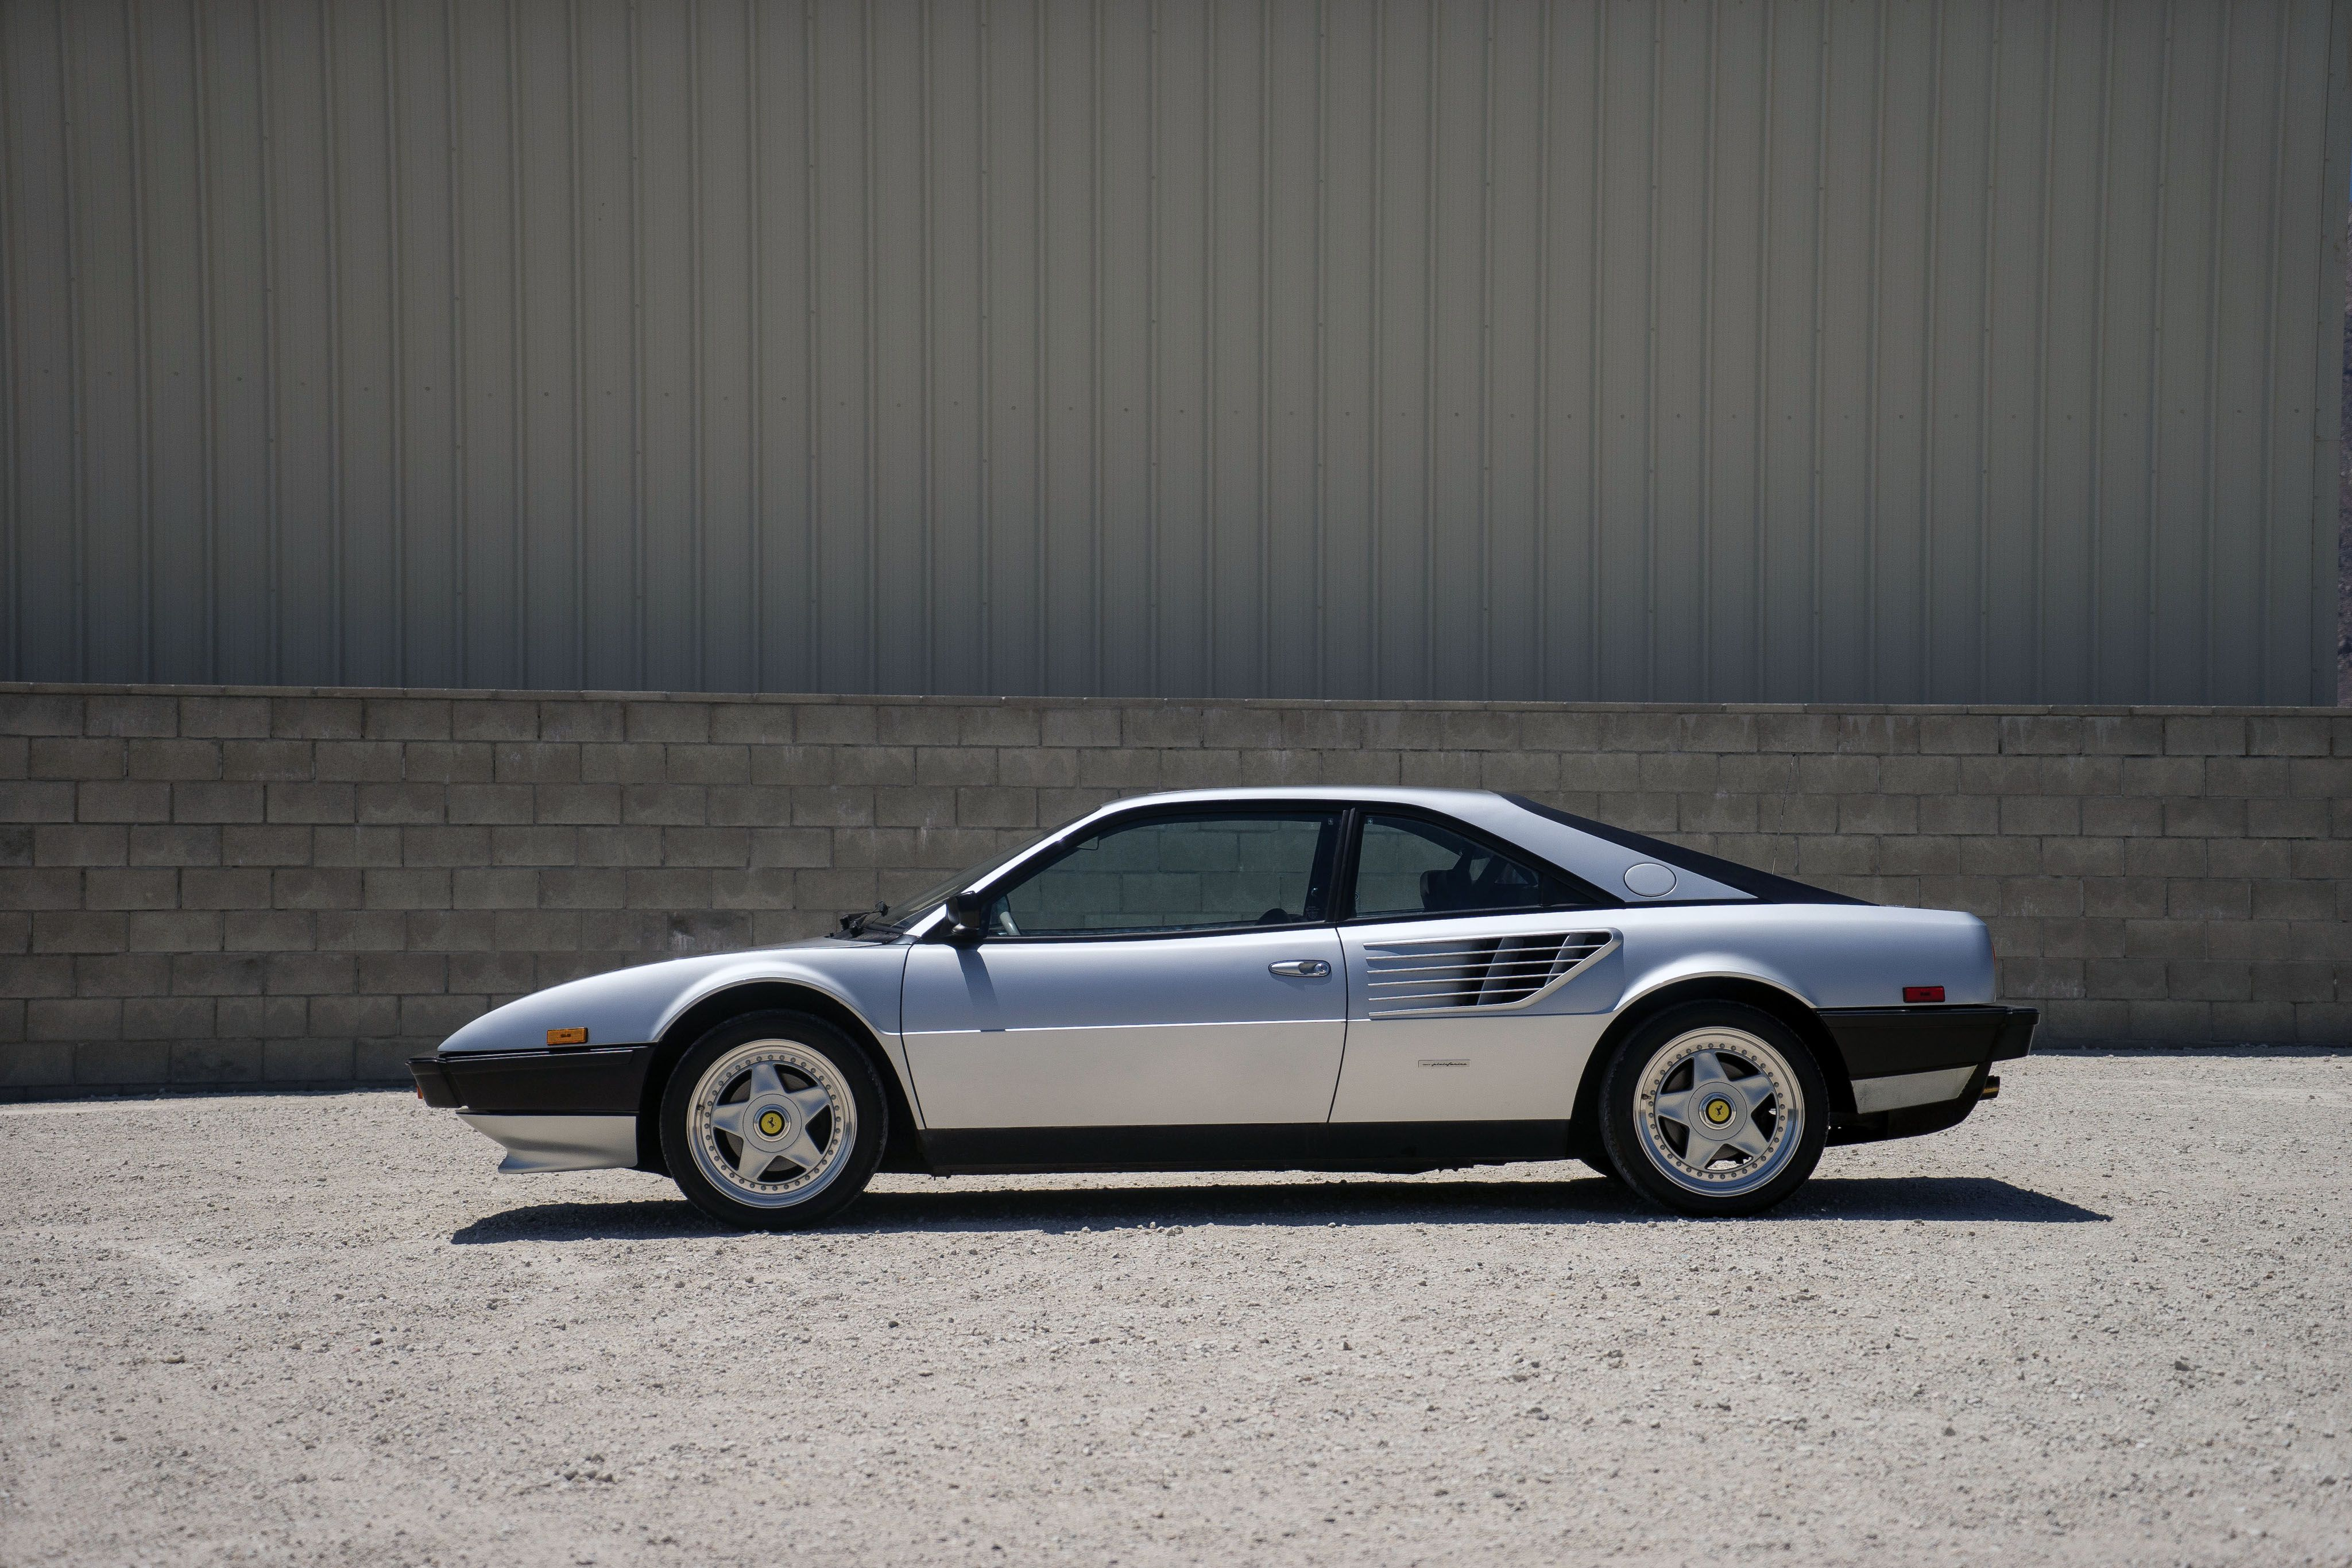 f39aafed38943a6f3a75e76a3c561dc8 Gorgeous Ferrari Mondial 3.2 Cabriolet V8 Quattrovalvole Cars Trend